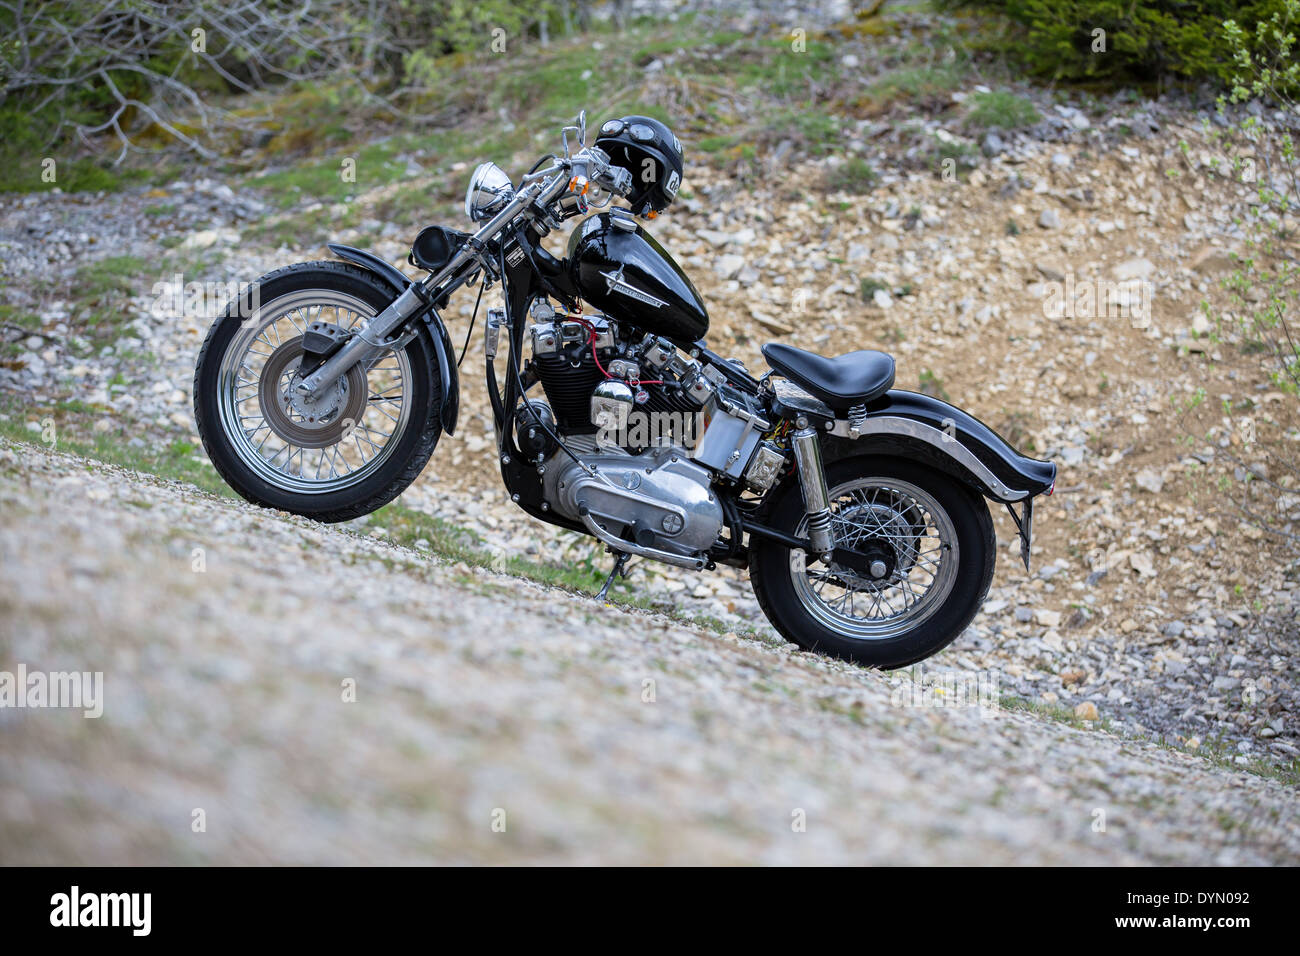 Harley Davidson Ironhead Oil Diagram Trusted Schematics 1975 Wiring Sportster Hose Www Topsimages Com Old School Custom